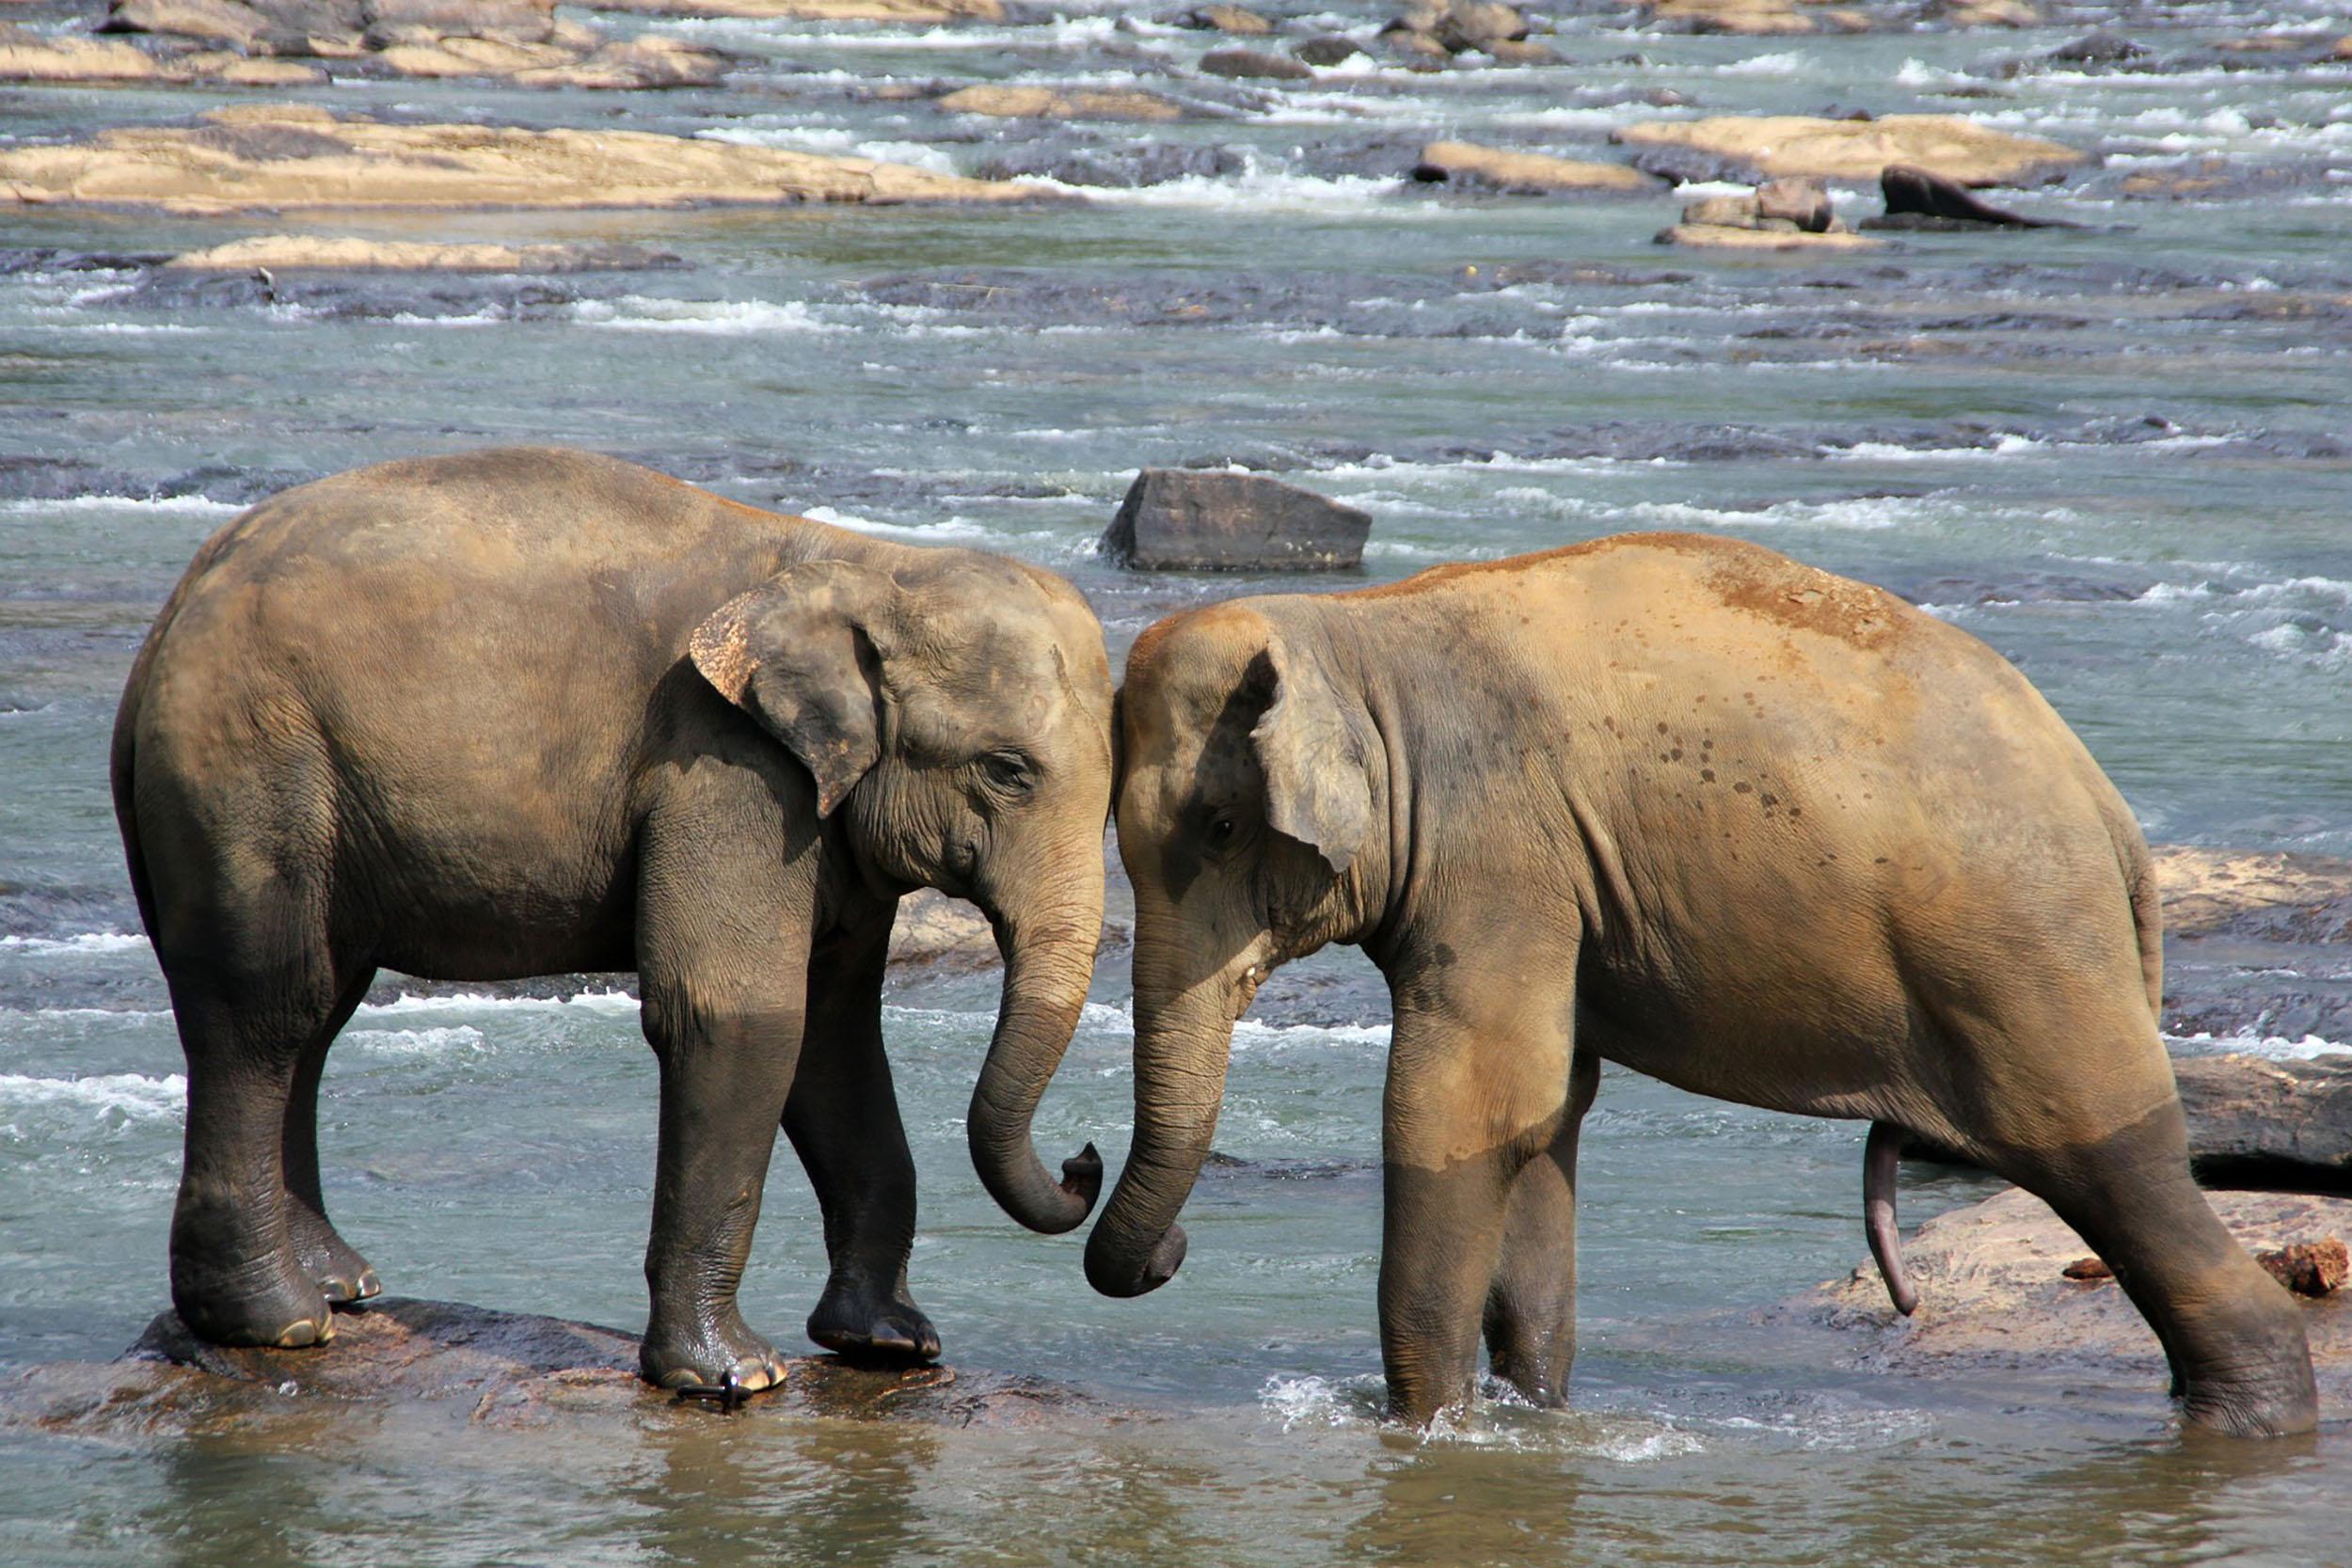 Sri Lanka is famous for its population of elephants